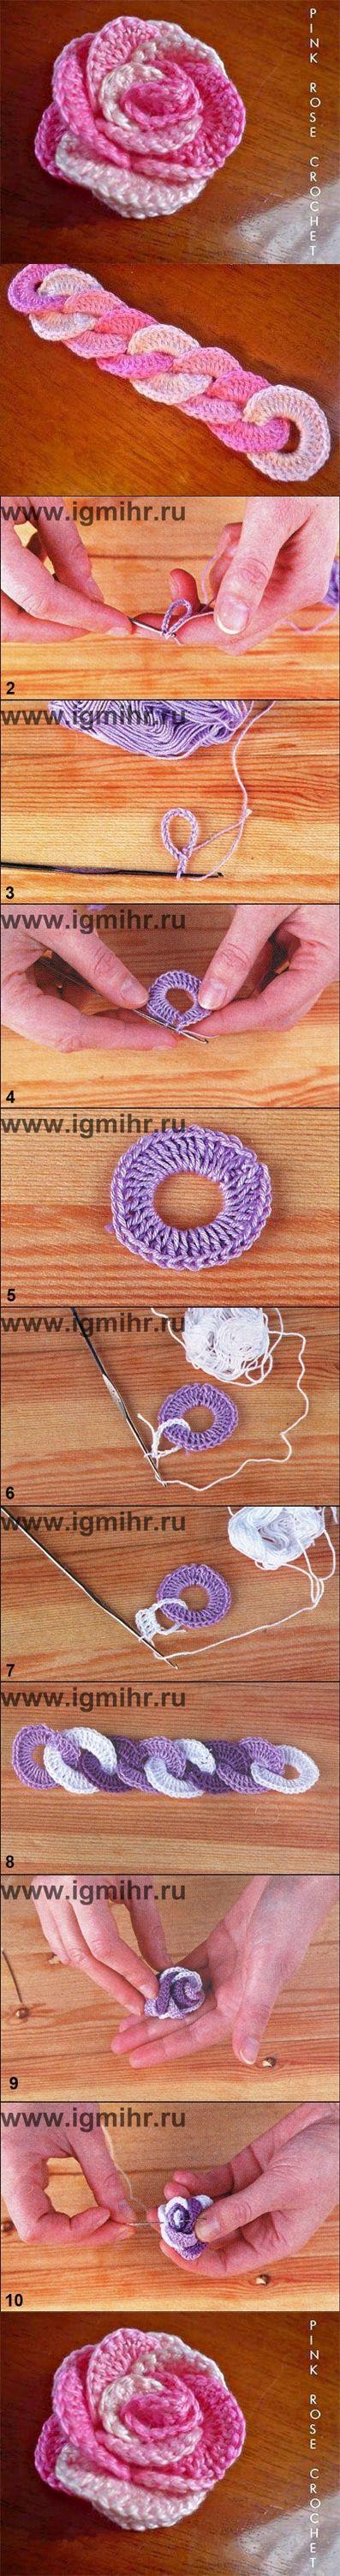 how to DIY Crochet Interlocking Rose, hairband, belt   www.FabArtDIY.com